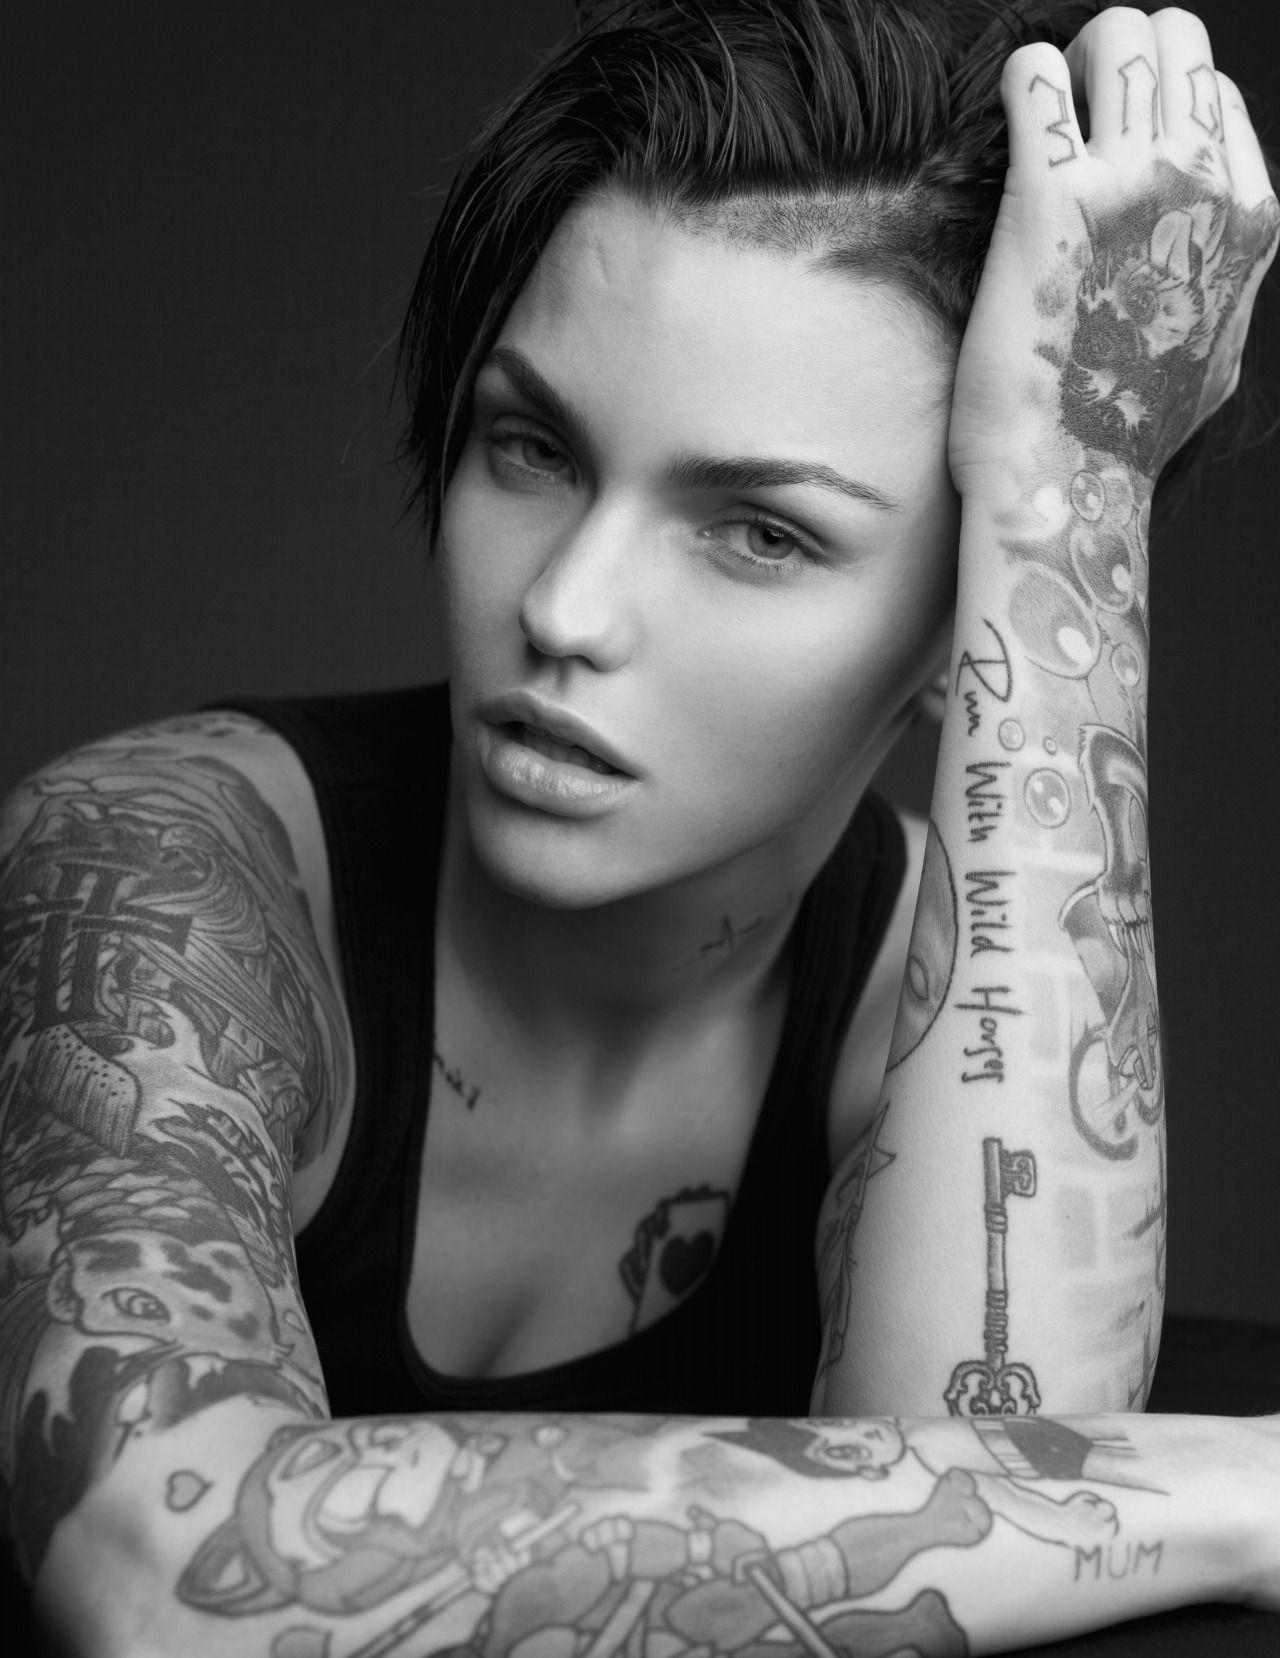 04f3bc7fa Ruby Rose | Ruby Rose | Ruby rose tattoo, Ruby rose, Rose tattoos